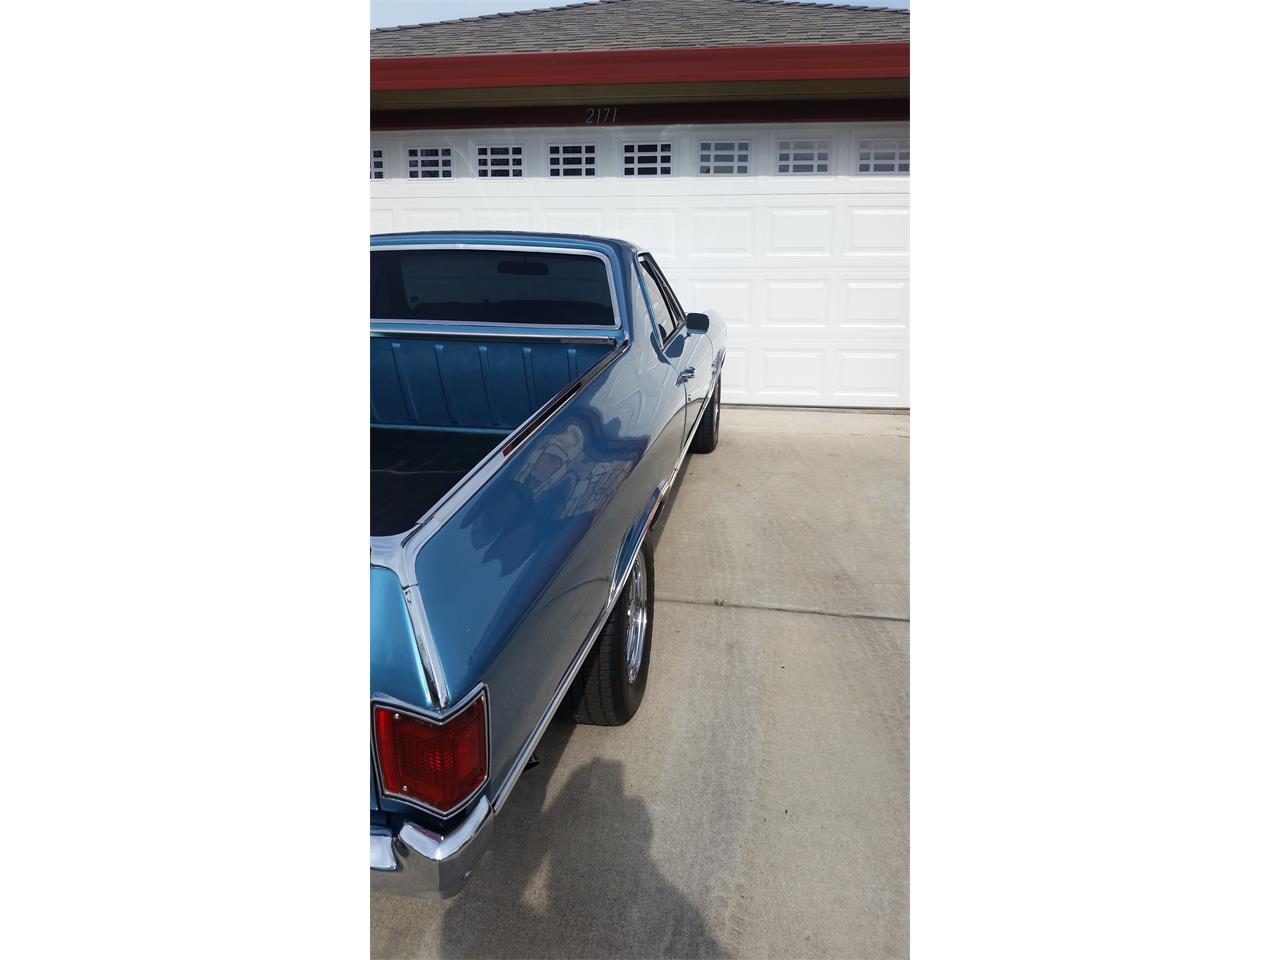 1972 Chevrolet El Camino (CC-1362056) for sale in Manteca, California